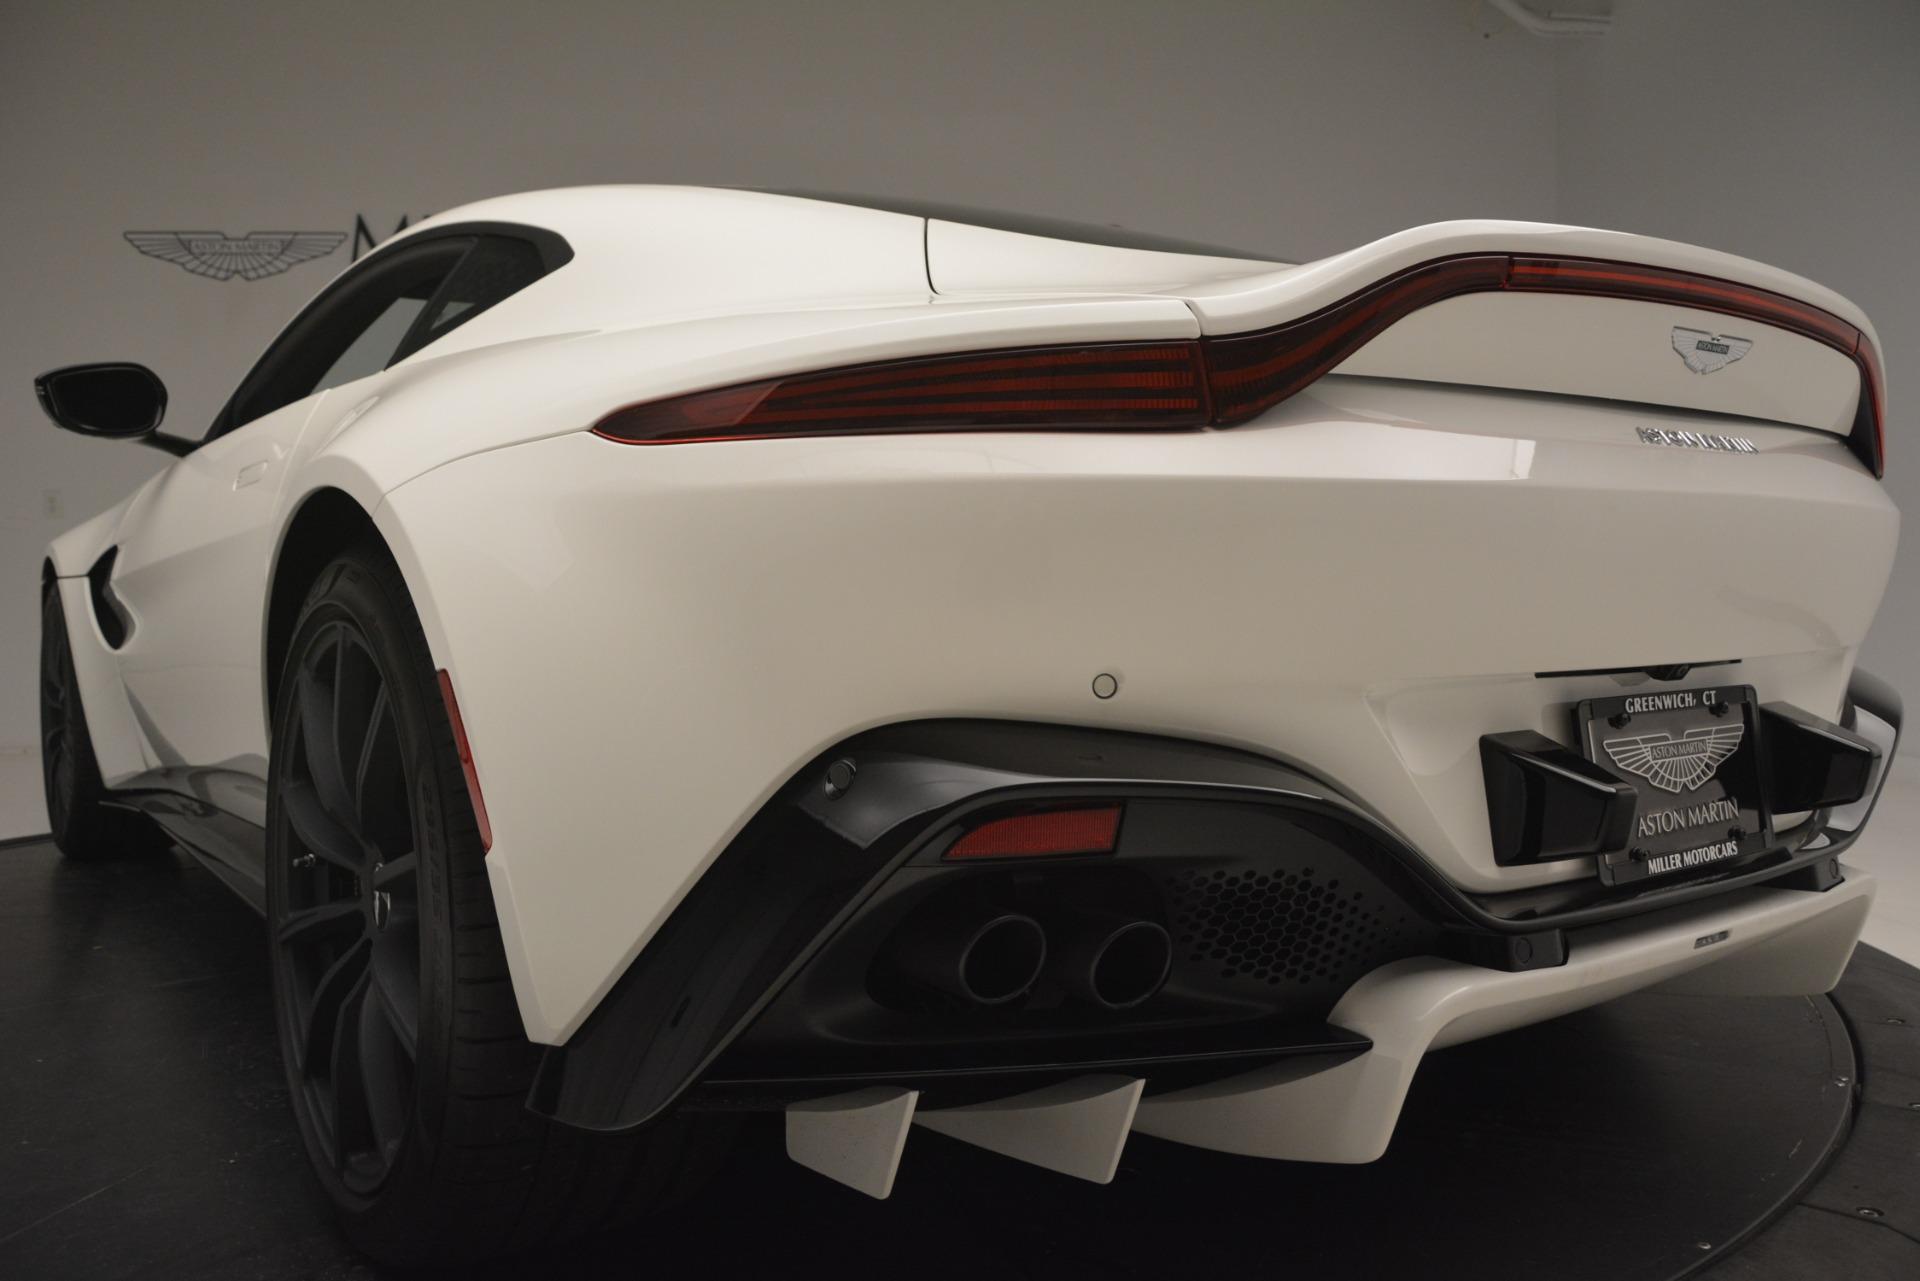 New 2019 Aston Martin Vantage Coupe For Sale In Greenwich, CT. Alfa Romeo of Greenwich, A1362 3053_p21